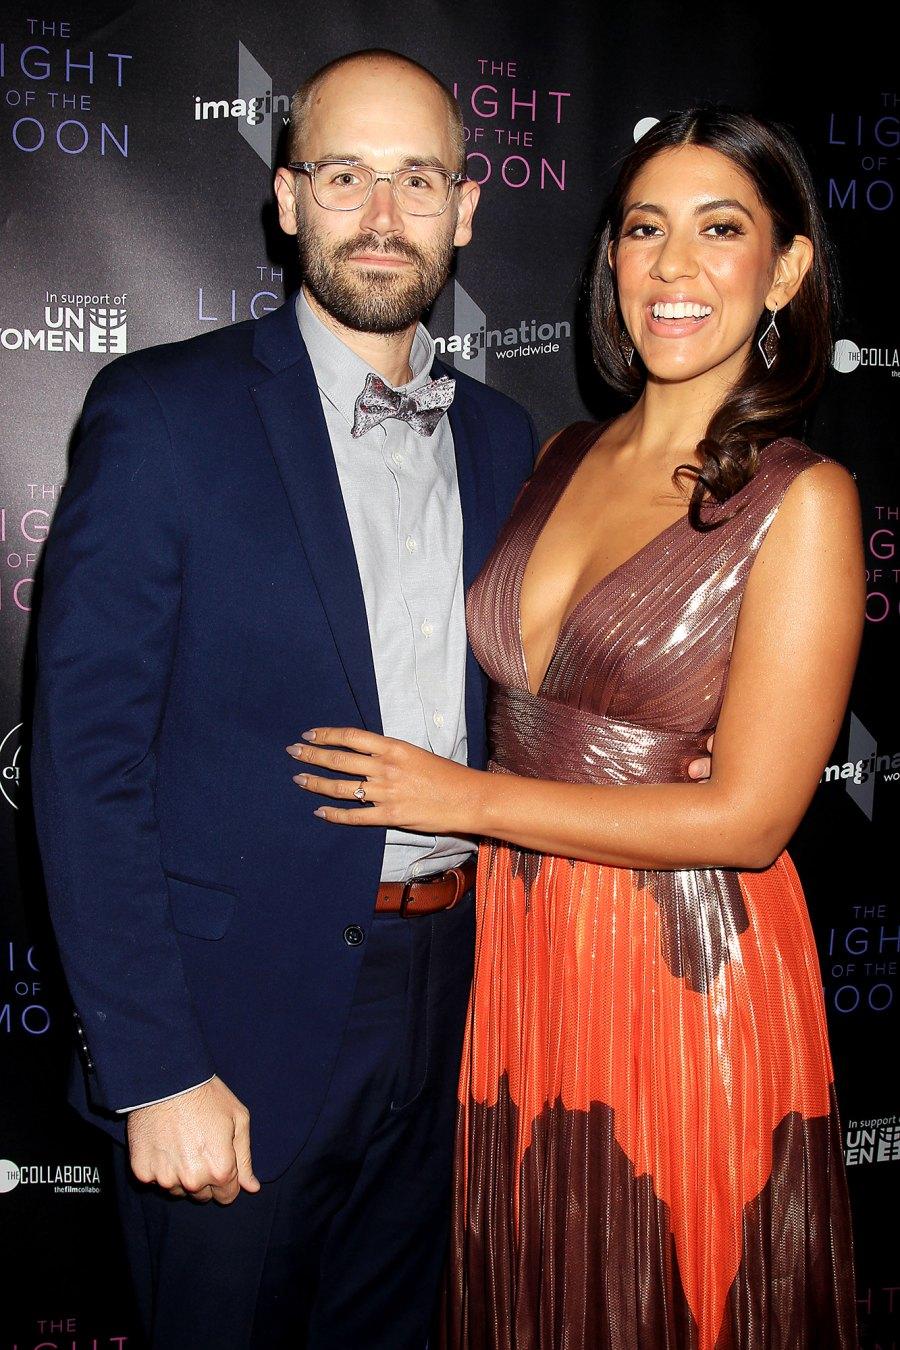 Brooklyn Nine-Nine's Stephanie Beatriz Is Pregnant, Expecting 1st Baby With Husband Brad Hoss